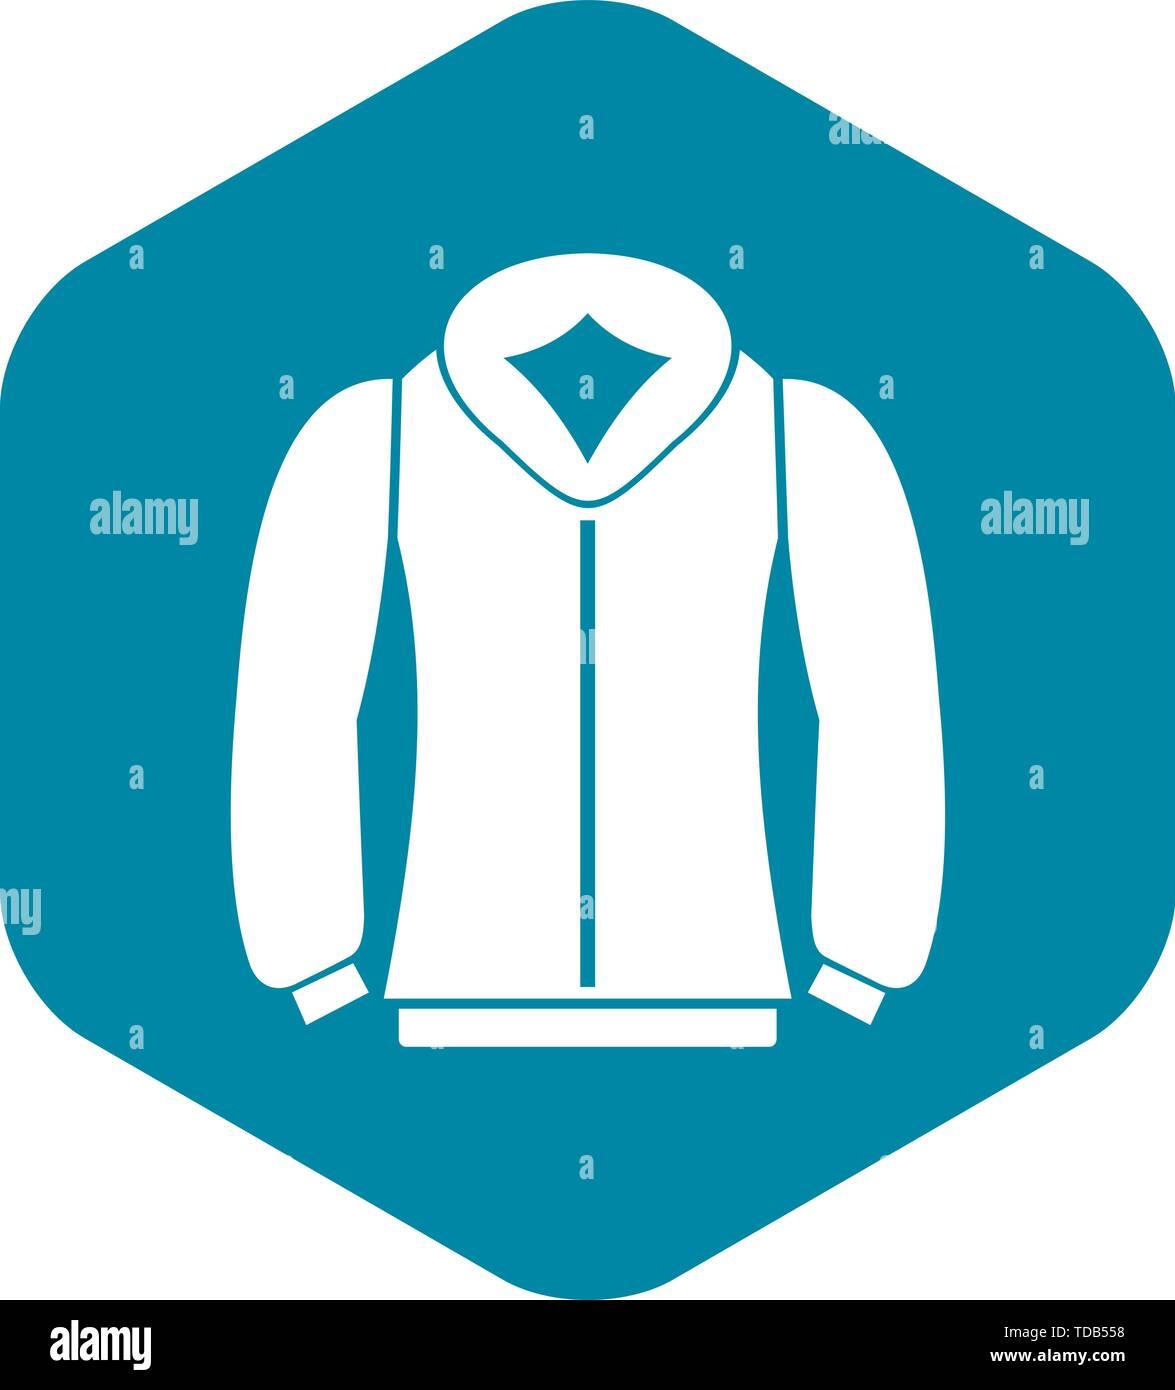 Sweatshirt icon in simple style - Stock Vector